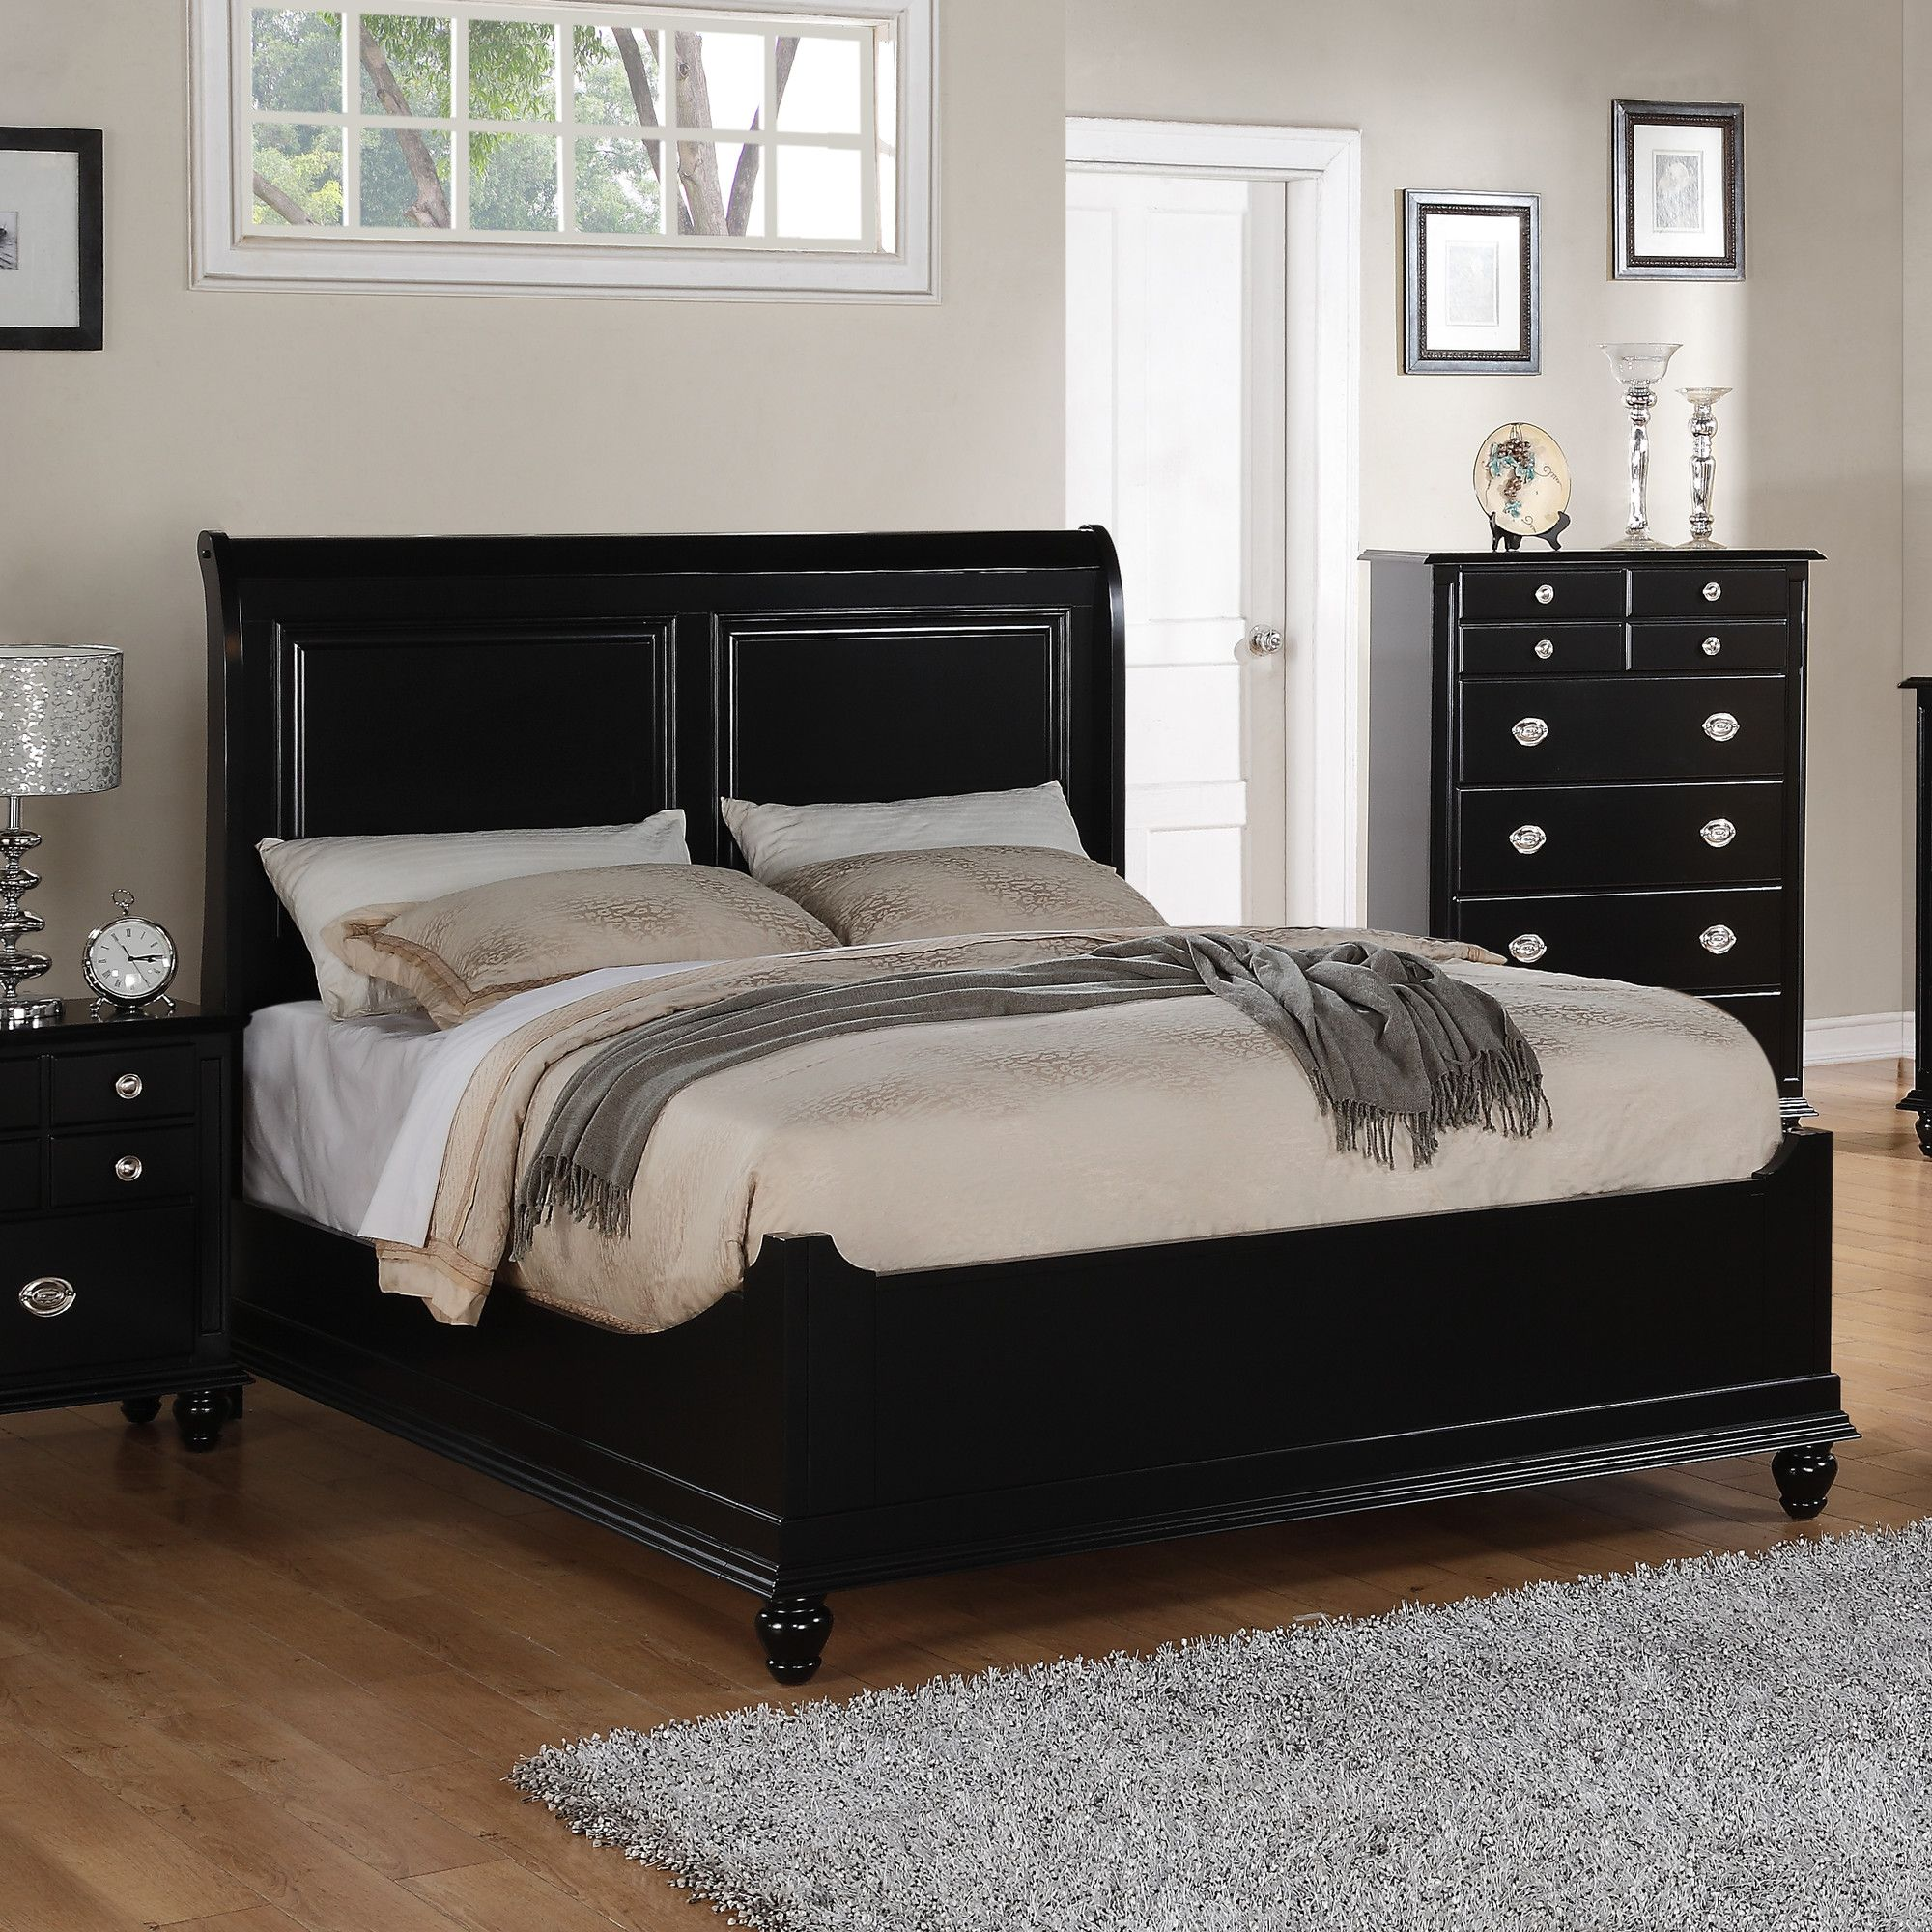 Daley Standard Bed Bed, Furniture, Home